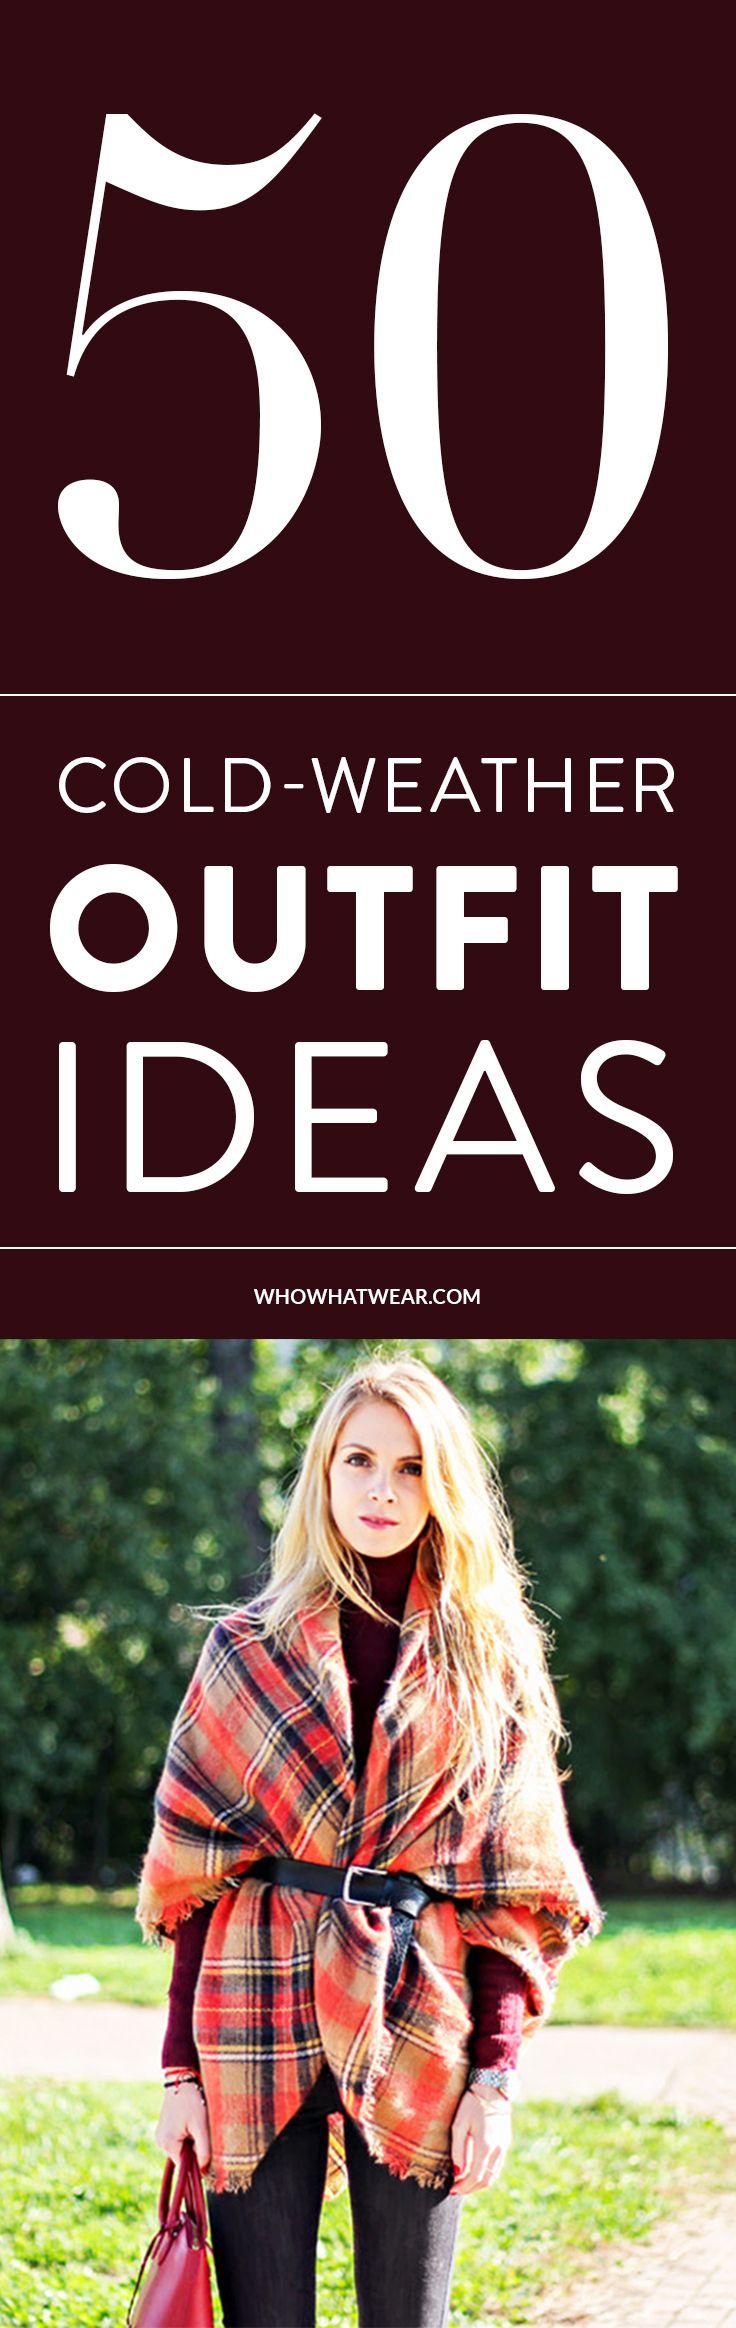 50 stylish outfit ideas to take you through the cold season.